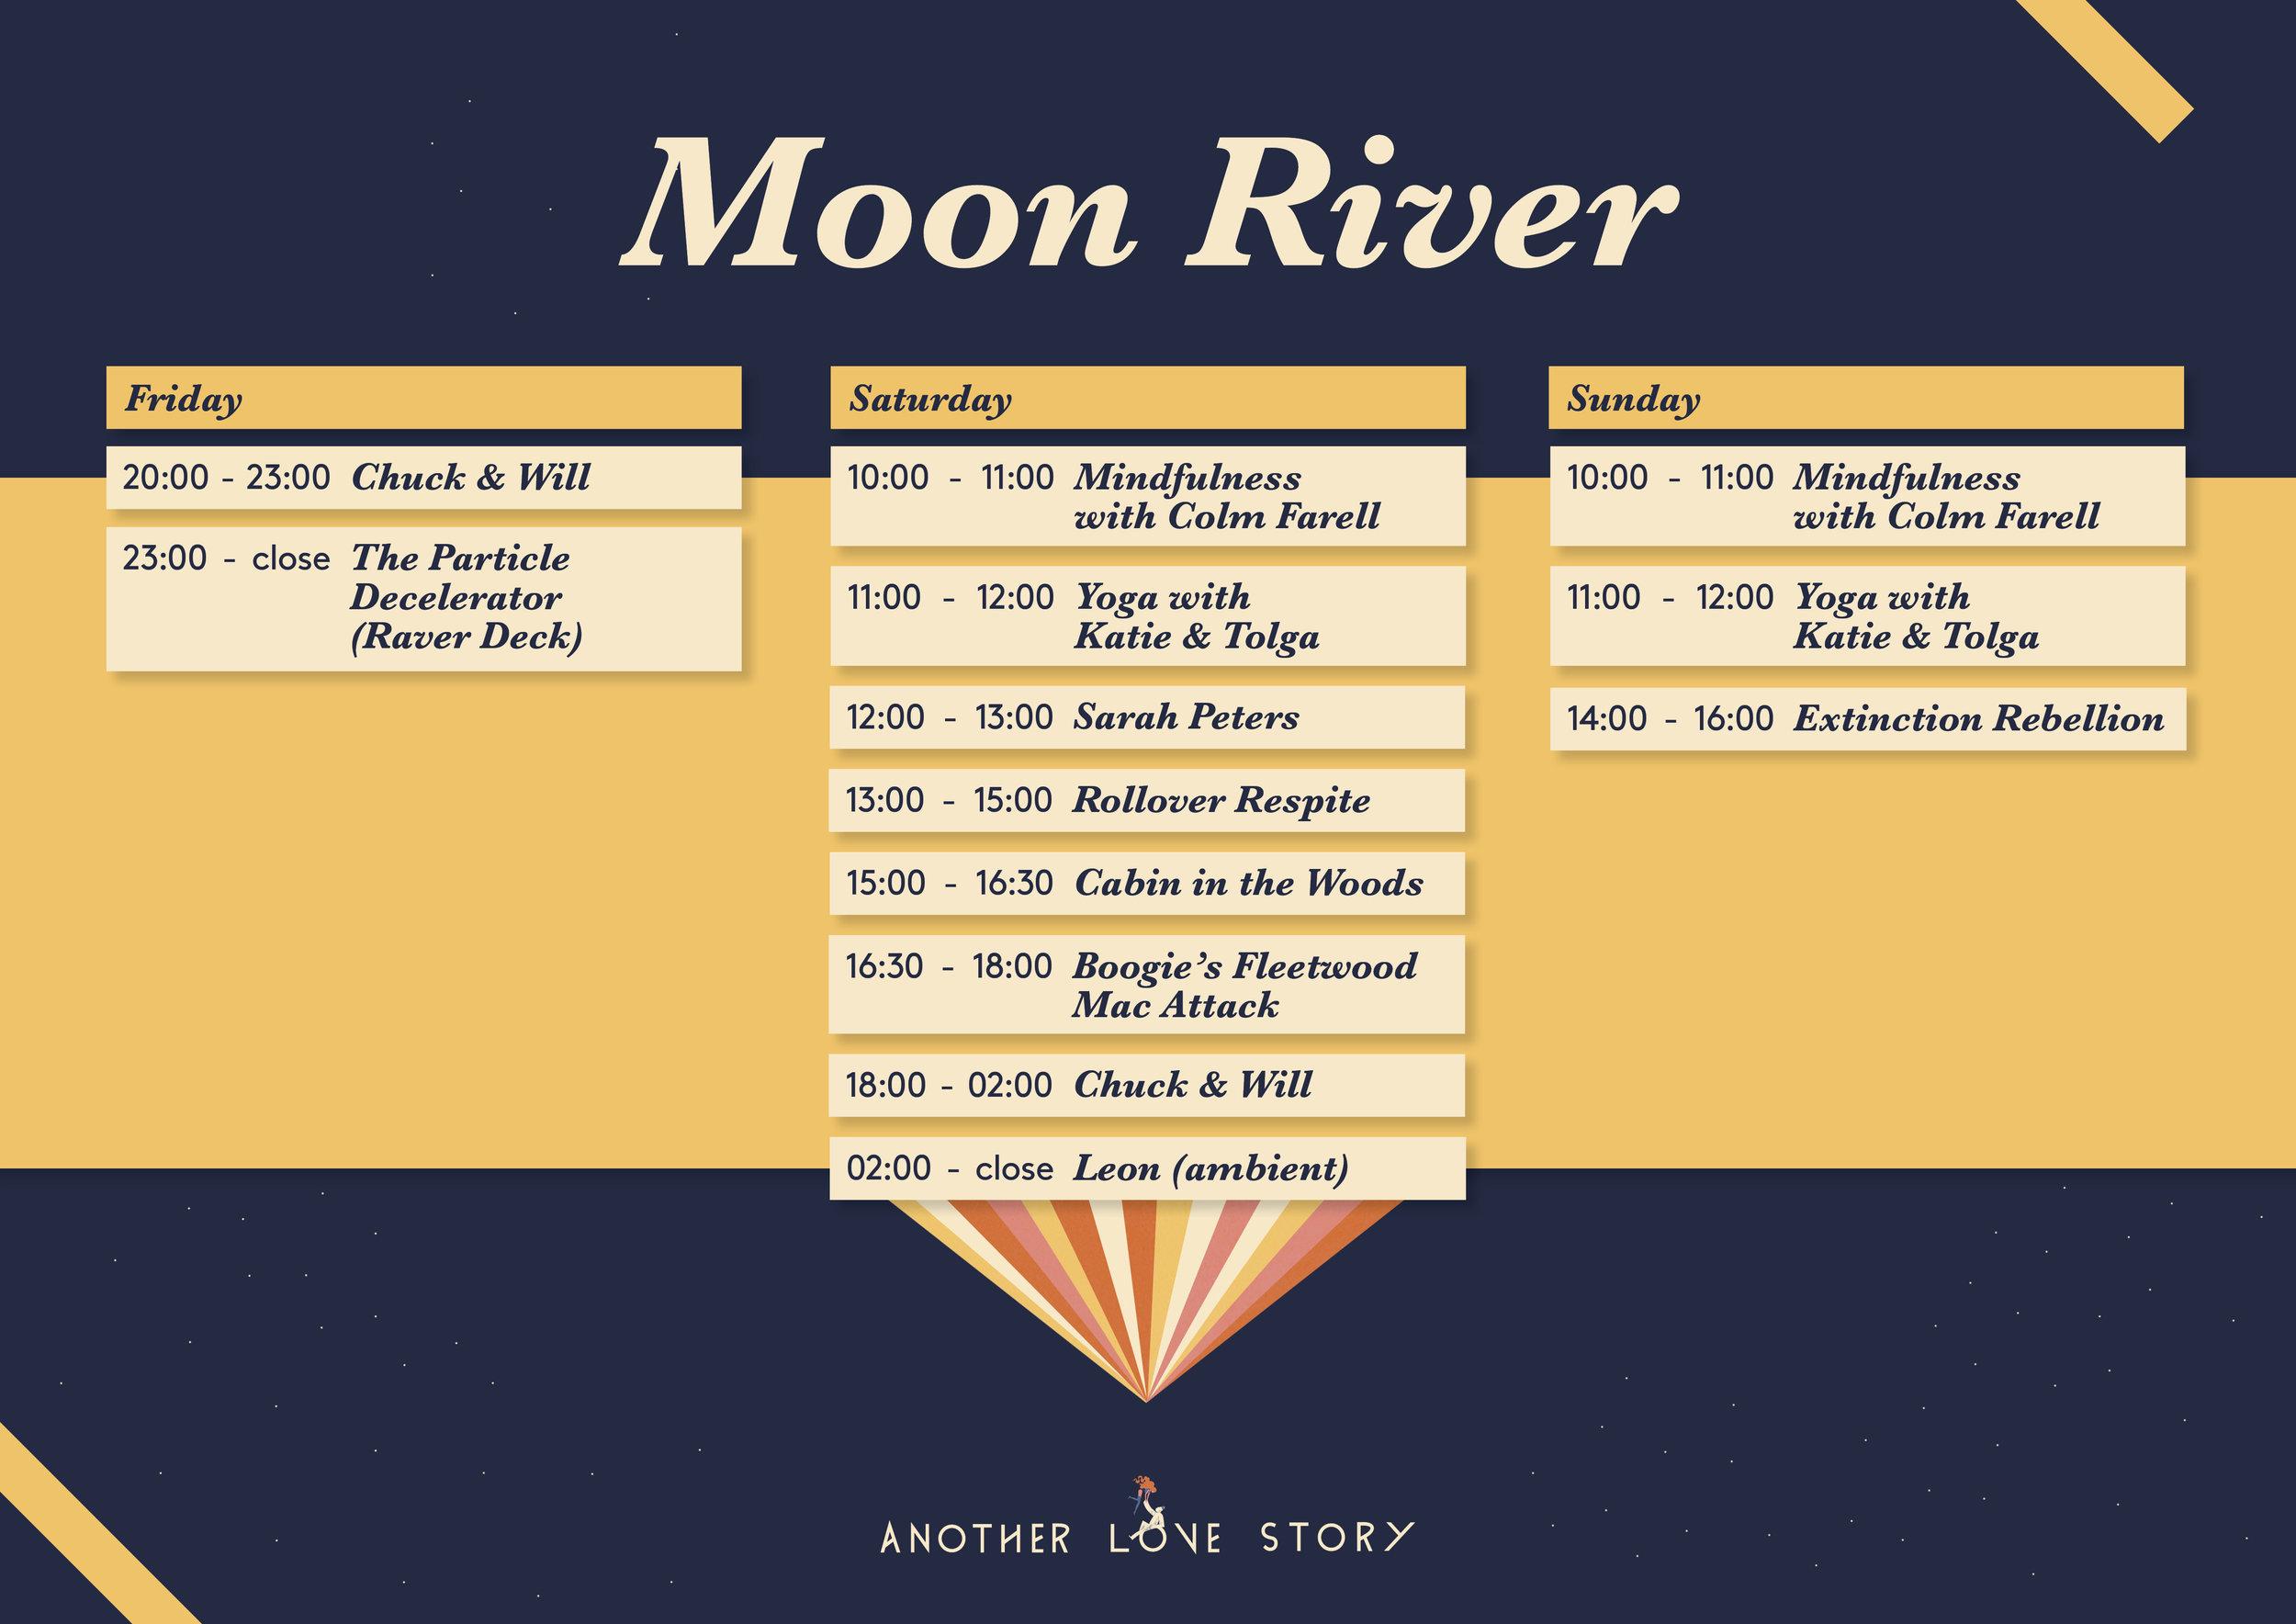 schedules_moon river.jpg